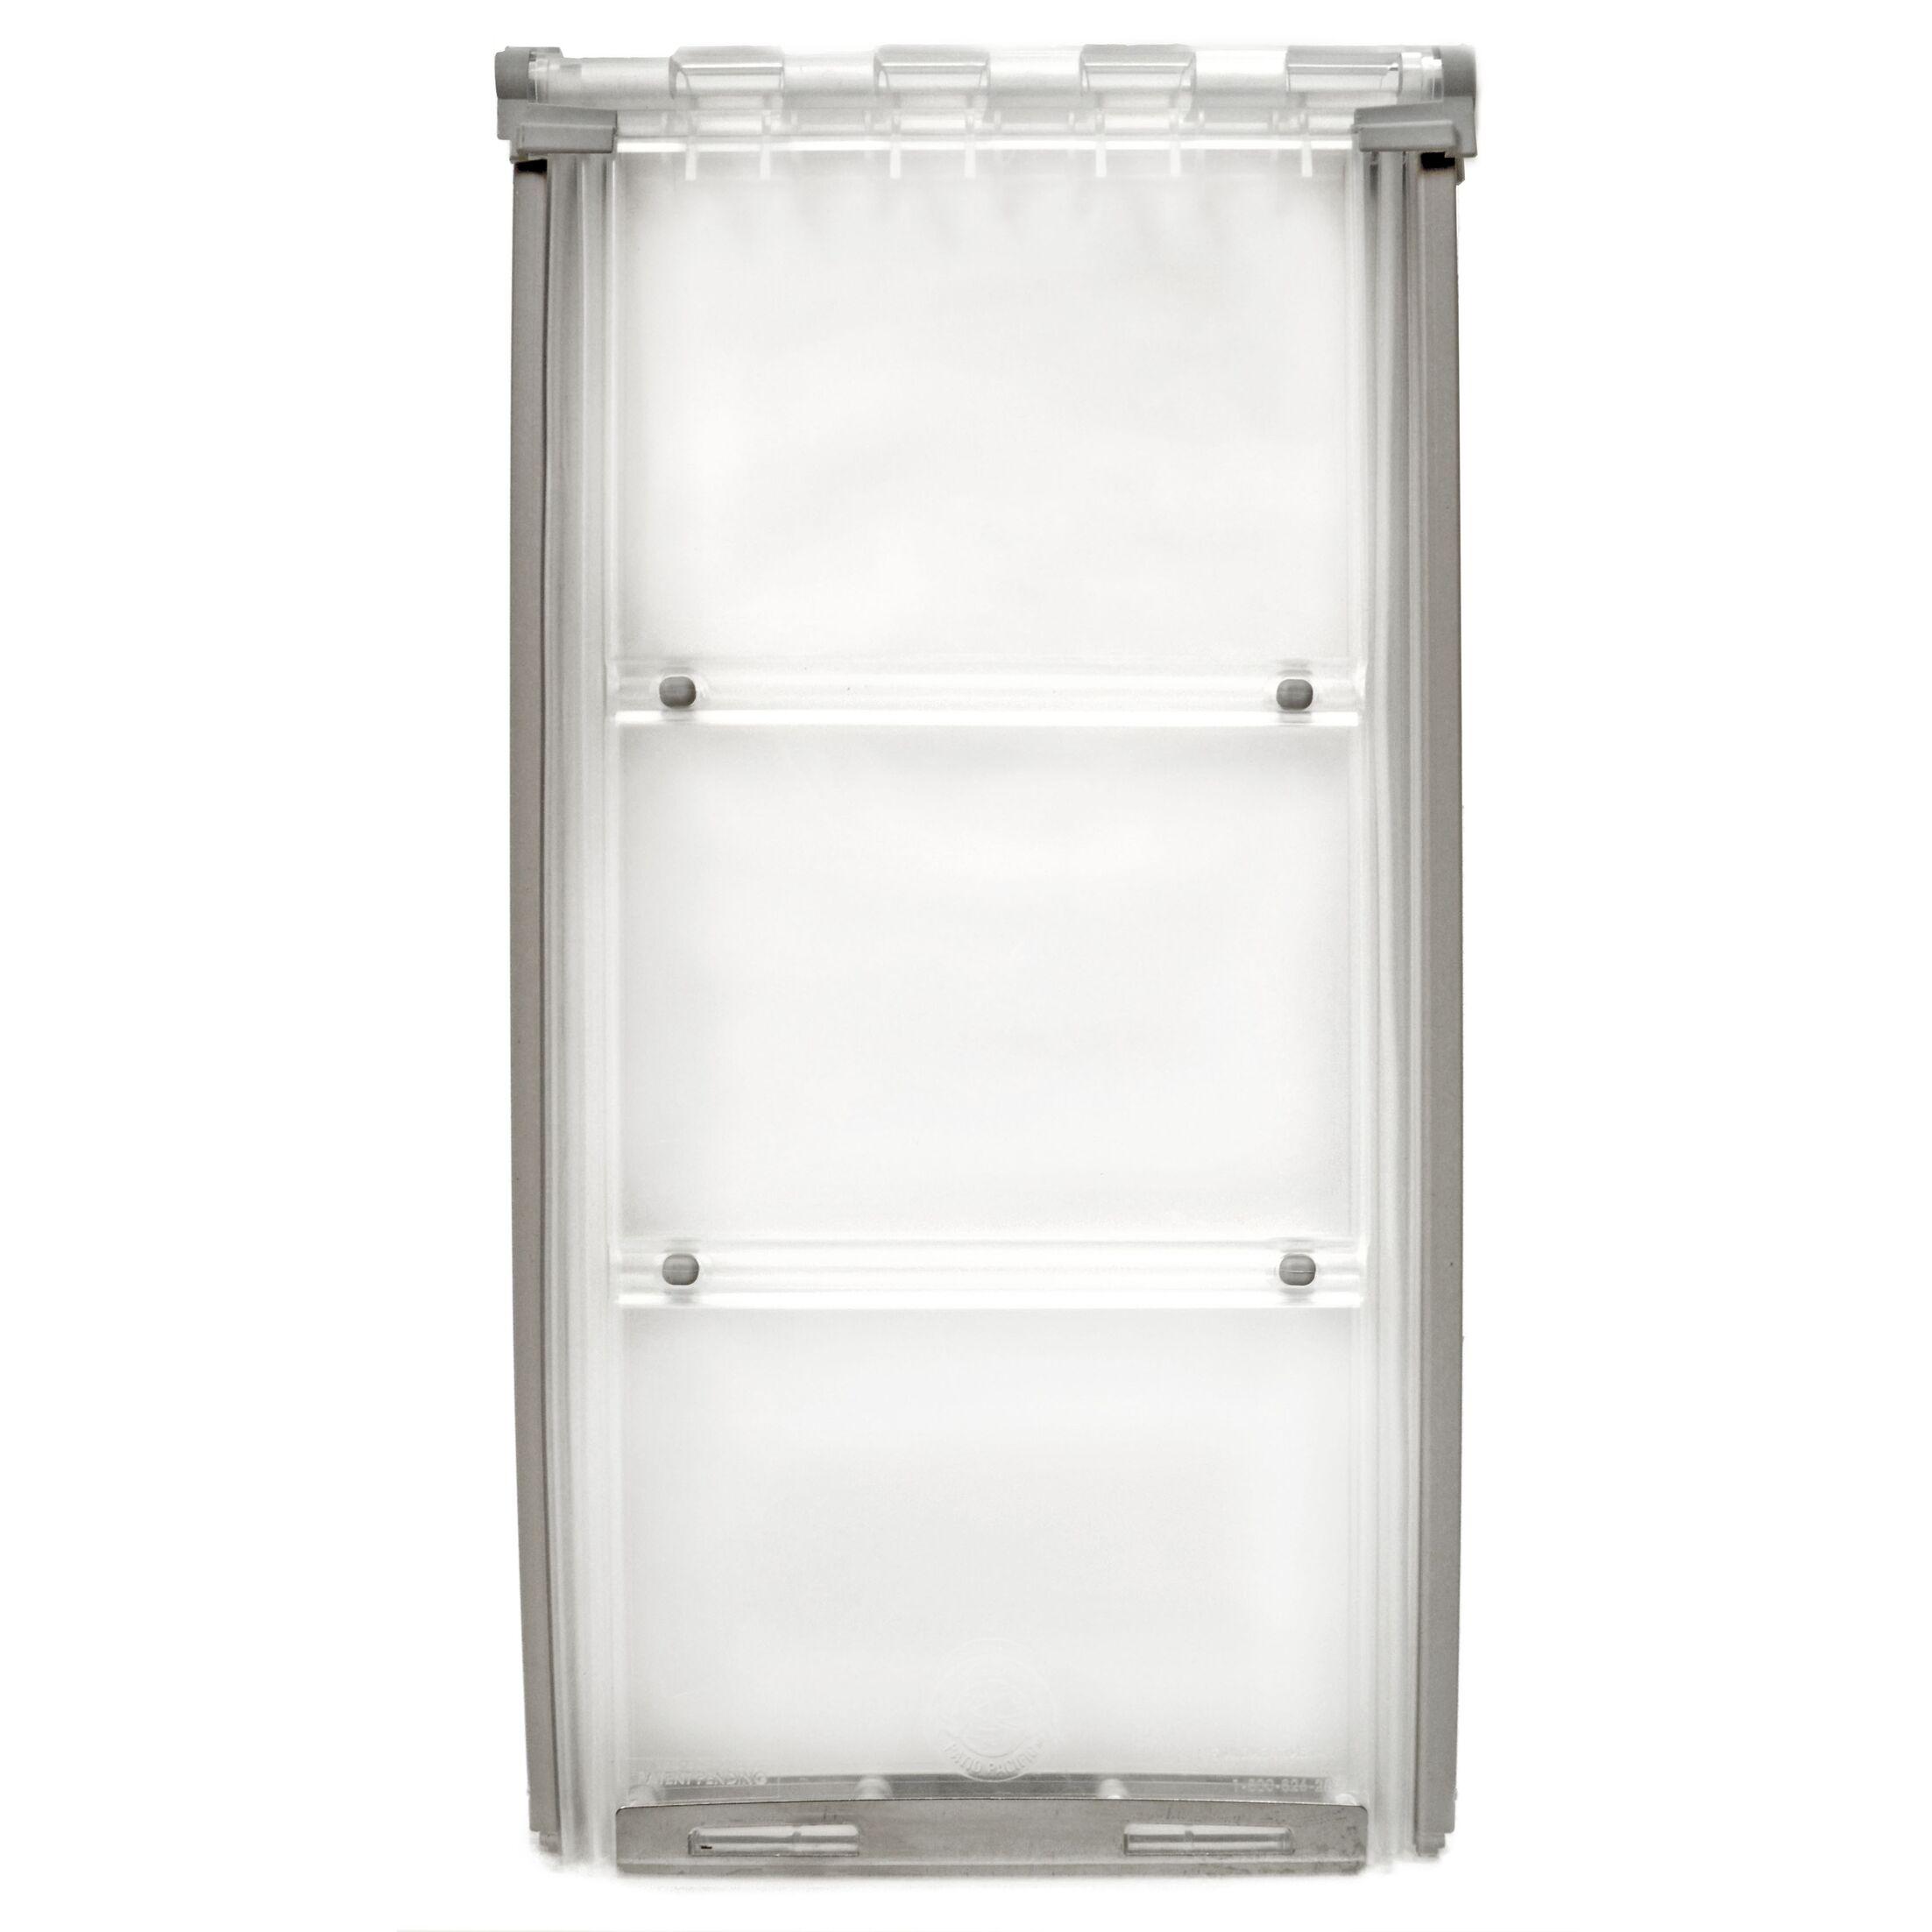 Endura Flap Thermo Panel 3E Pet Door Color: White, Flap Size: Large, Frame Size: 93.25